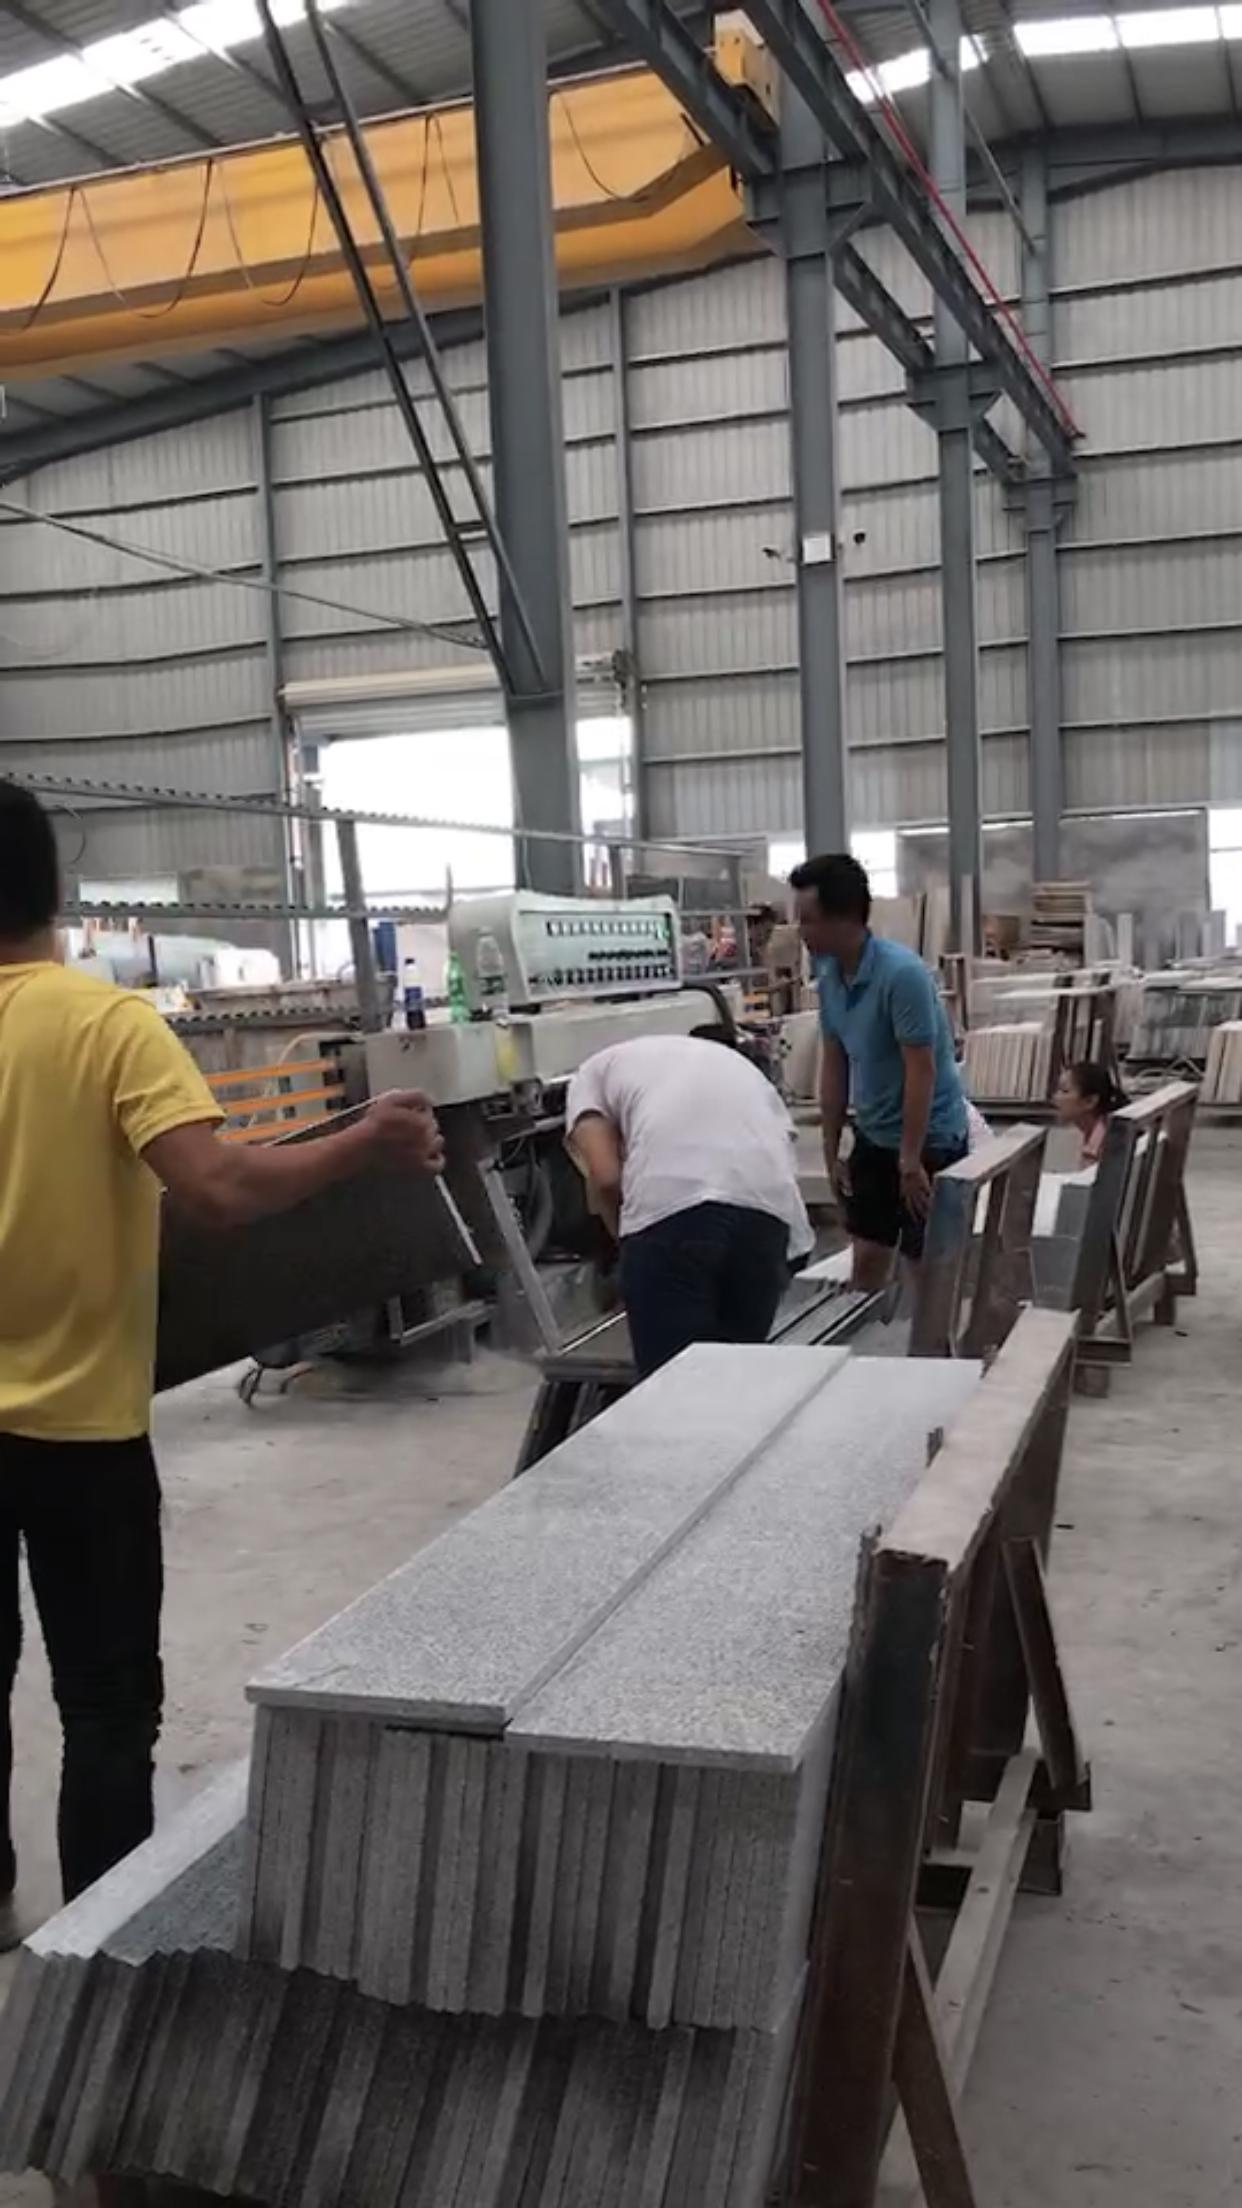 Vietnamese customer delegation visits Syborn Machinery